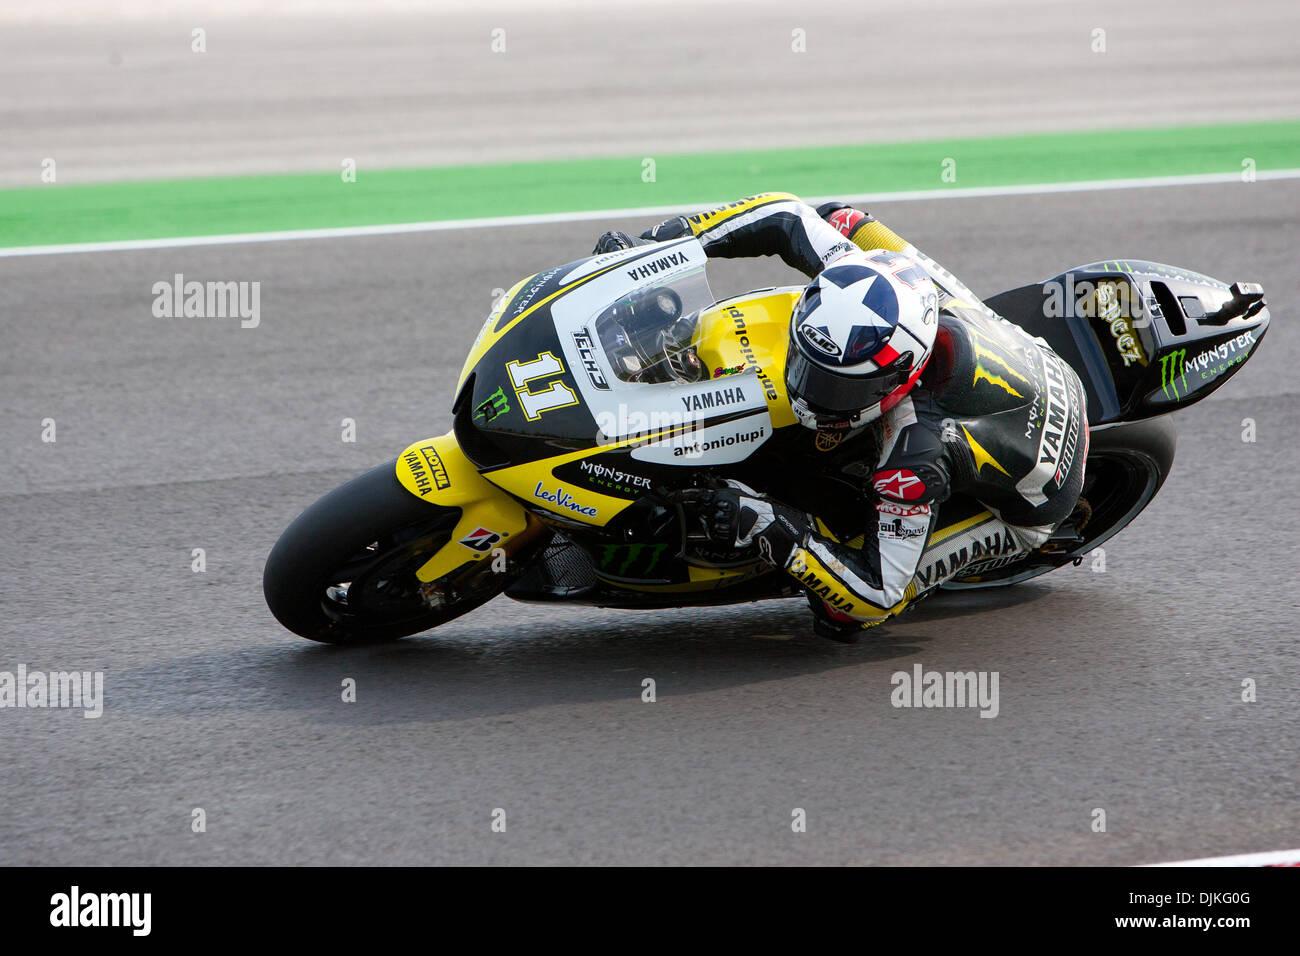 Sep. 05, 2010 - Misano Adriatico, Italy - Tech3 Yamaha rider Ben Spies (USA #11)  during the San Marino GP in Misano Adriatico, Italy. (Credit Image: © Andrea Ranalli/Southcreek Global/ZUMApress.com) - Stock Image